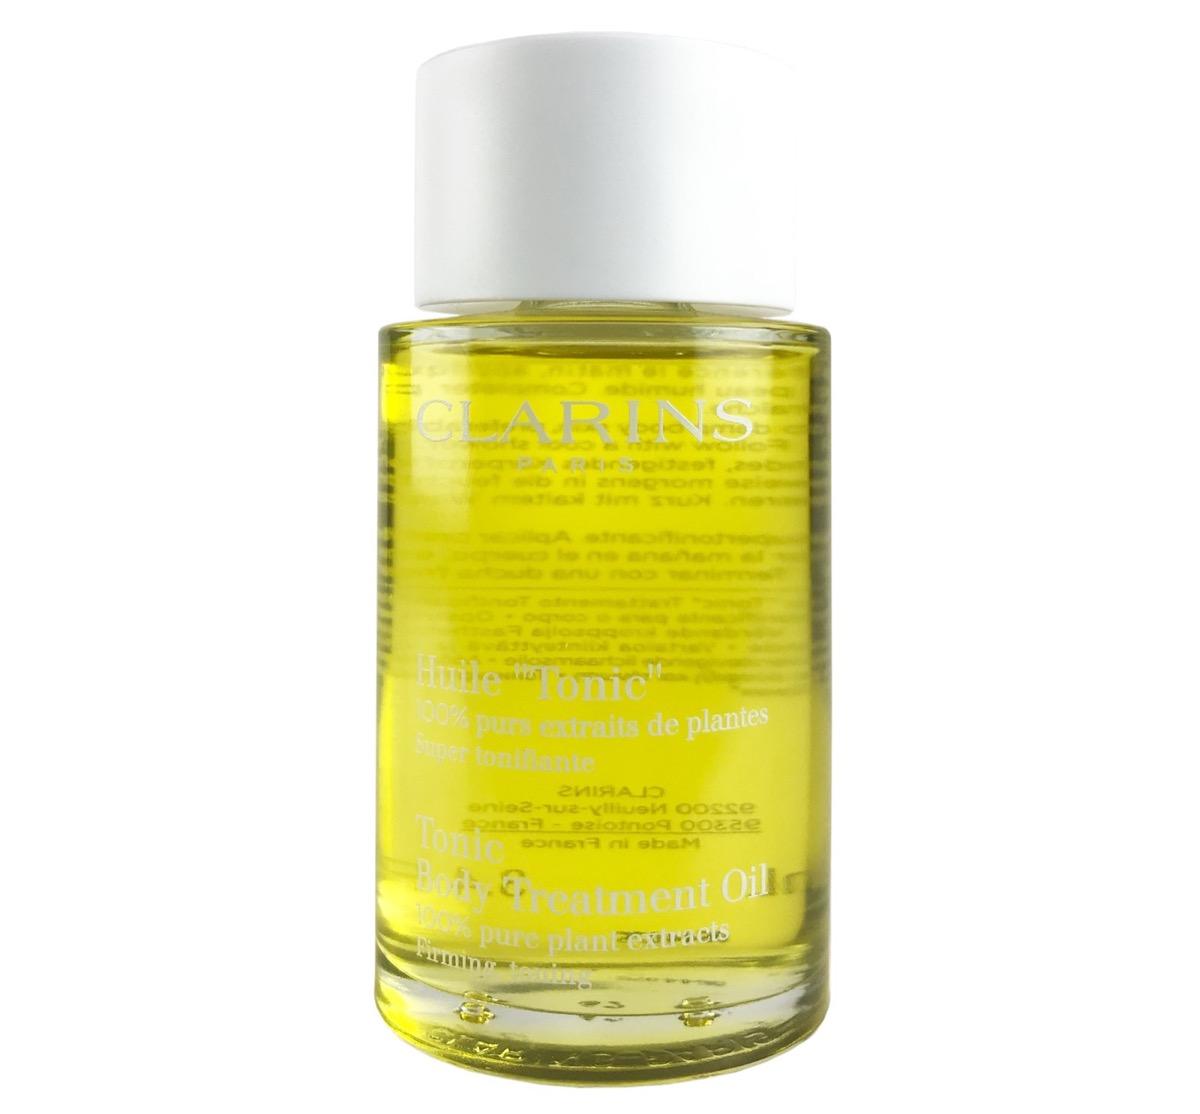 Clarins Tonic Body Treatment Oil - 100ml